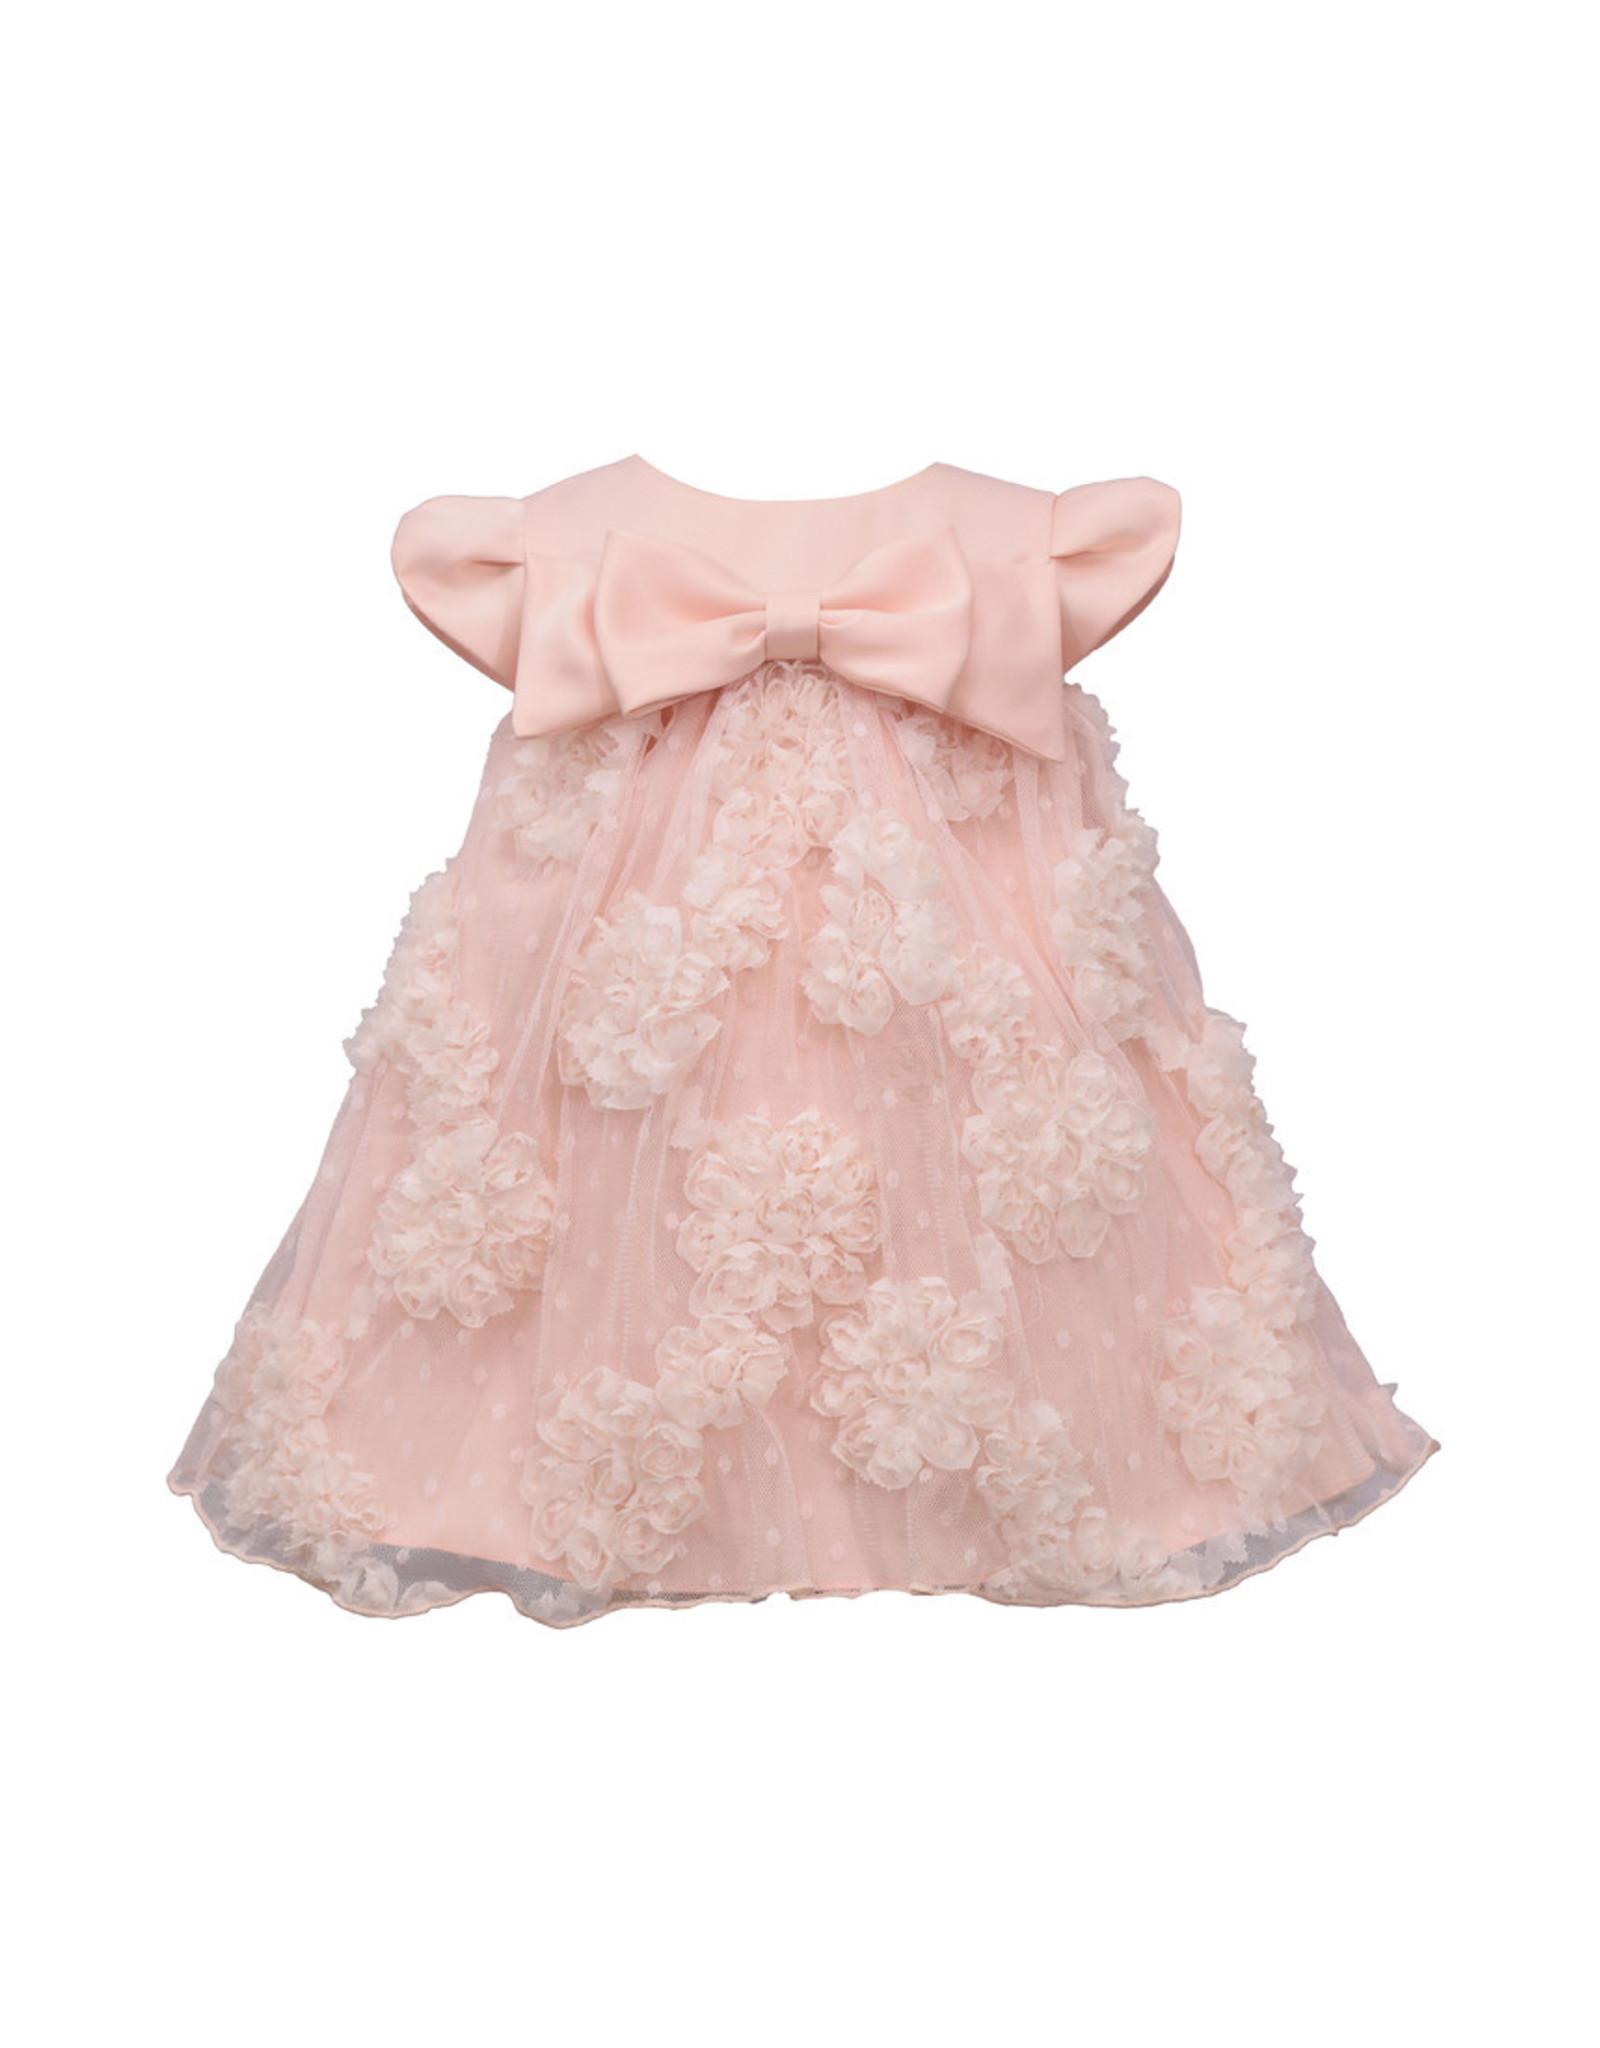 Bonnie  Jean Bonnie Baby- Peach Matte Satin Dress w/Bloomer